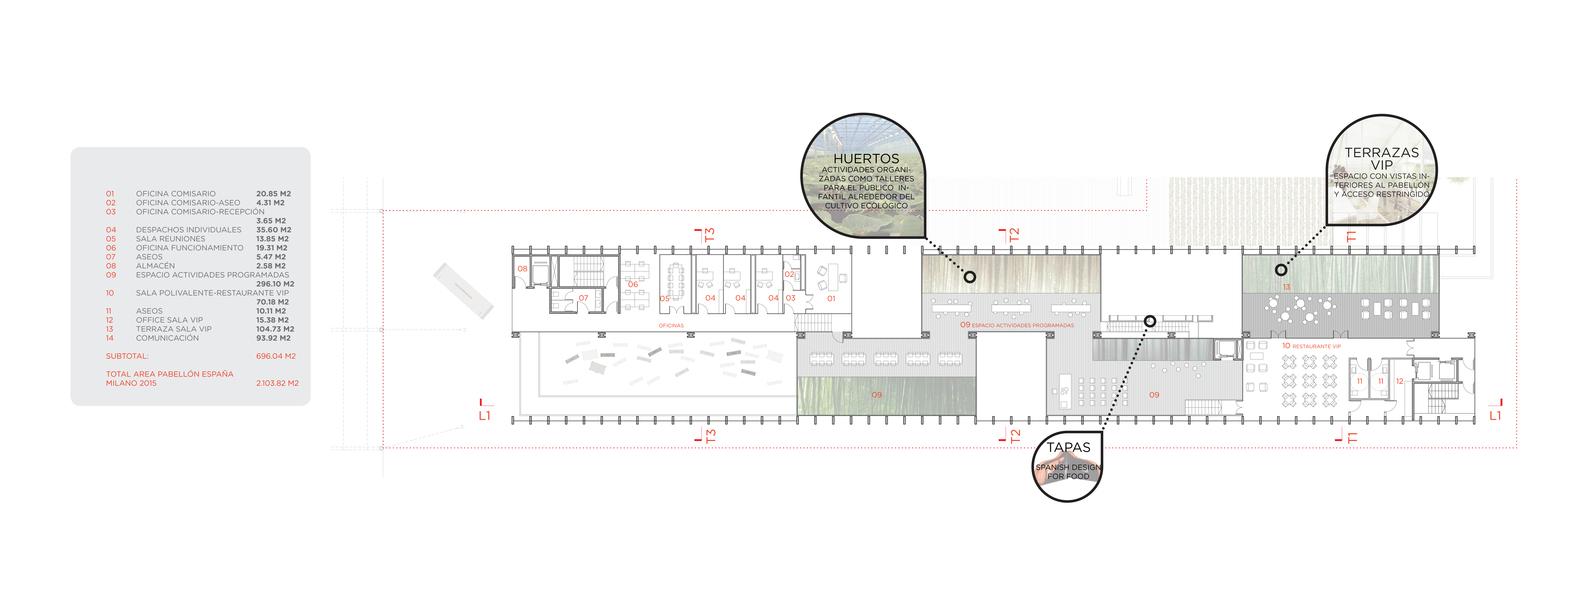 Spain Pavilion at Expo Milano 2015